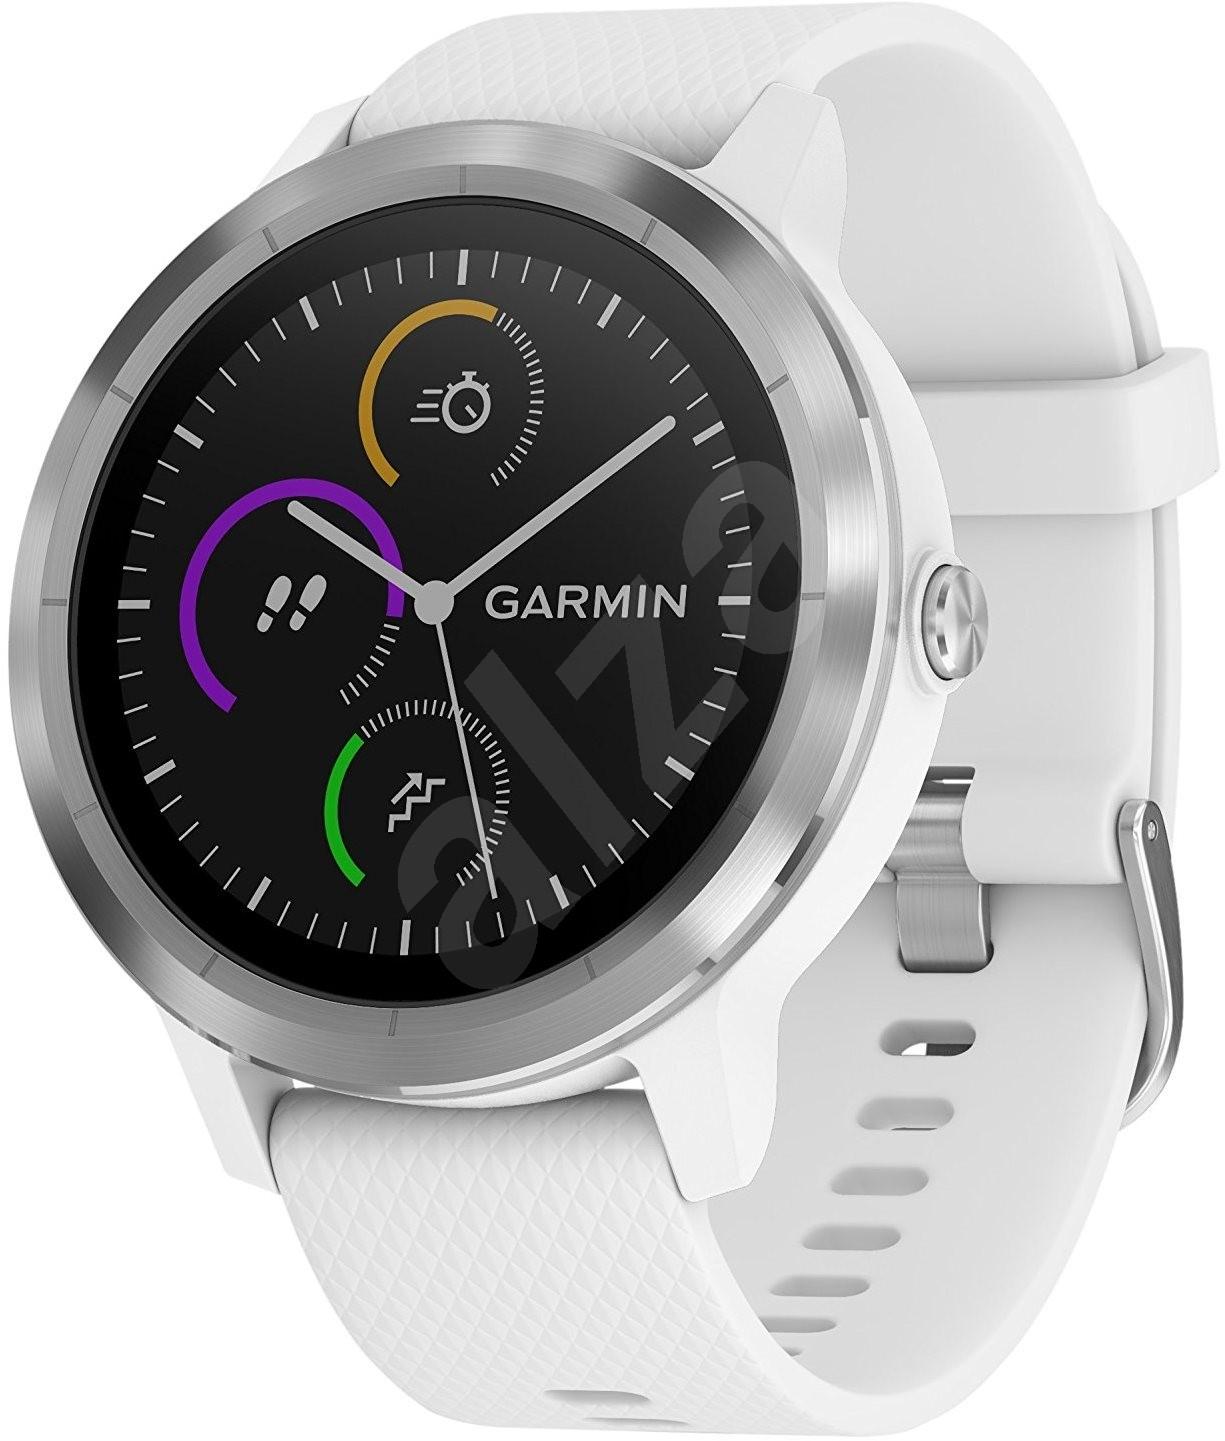 07d9fc6a1 Garmin vívoactive 3 White Silver - Chytré hodinky